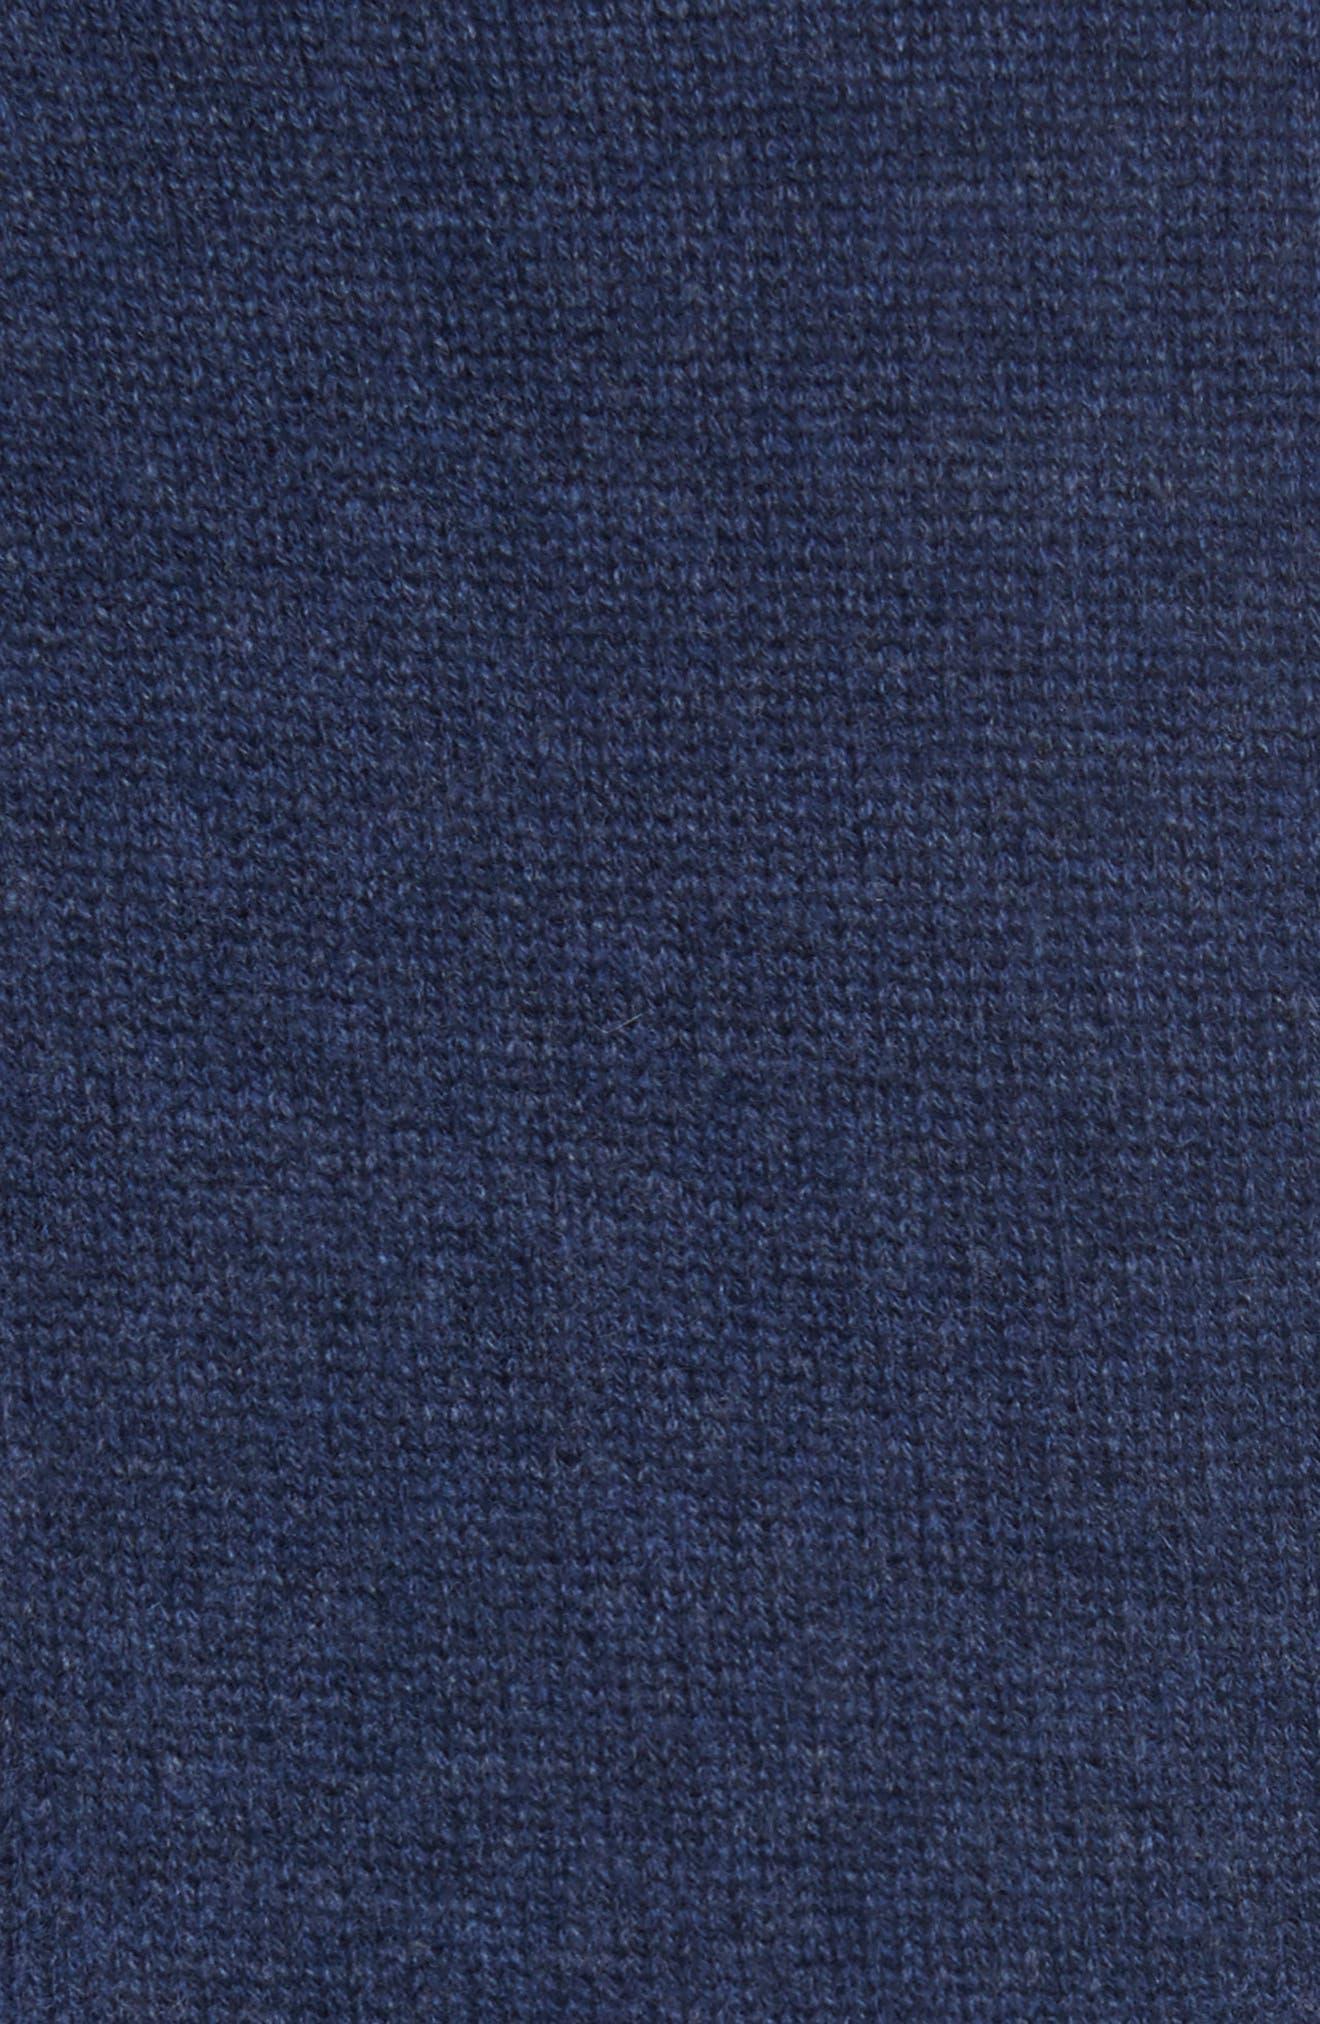 Keller Layered Sweater,                             Alternate thumbnail 10, color,